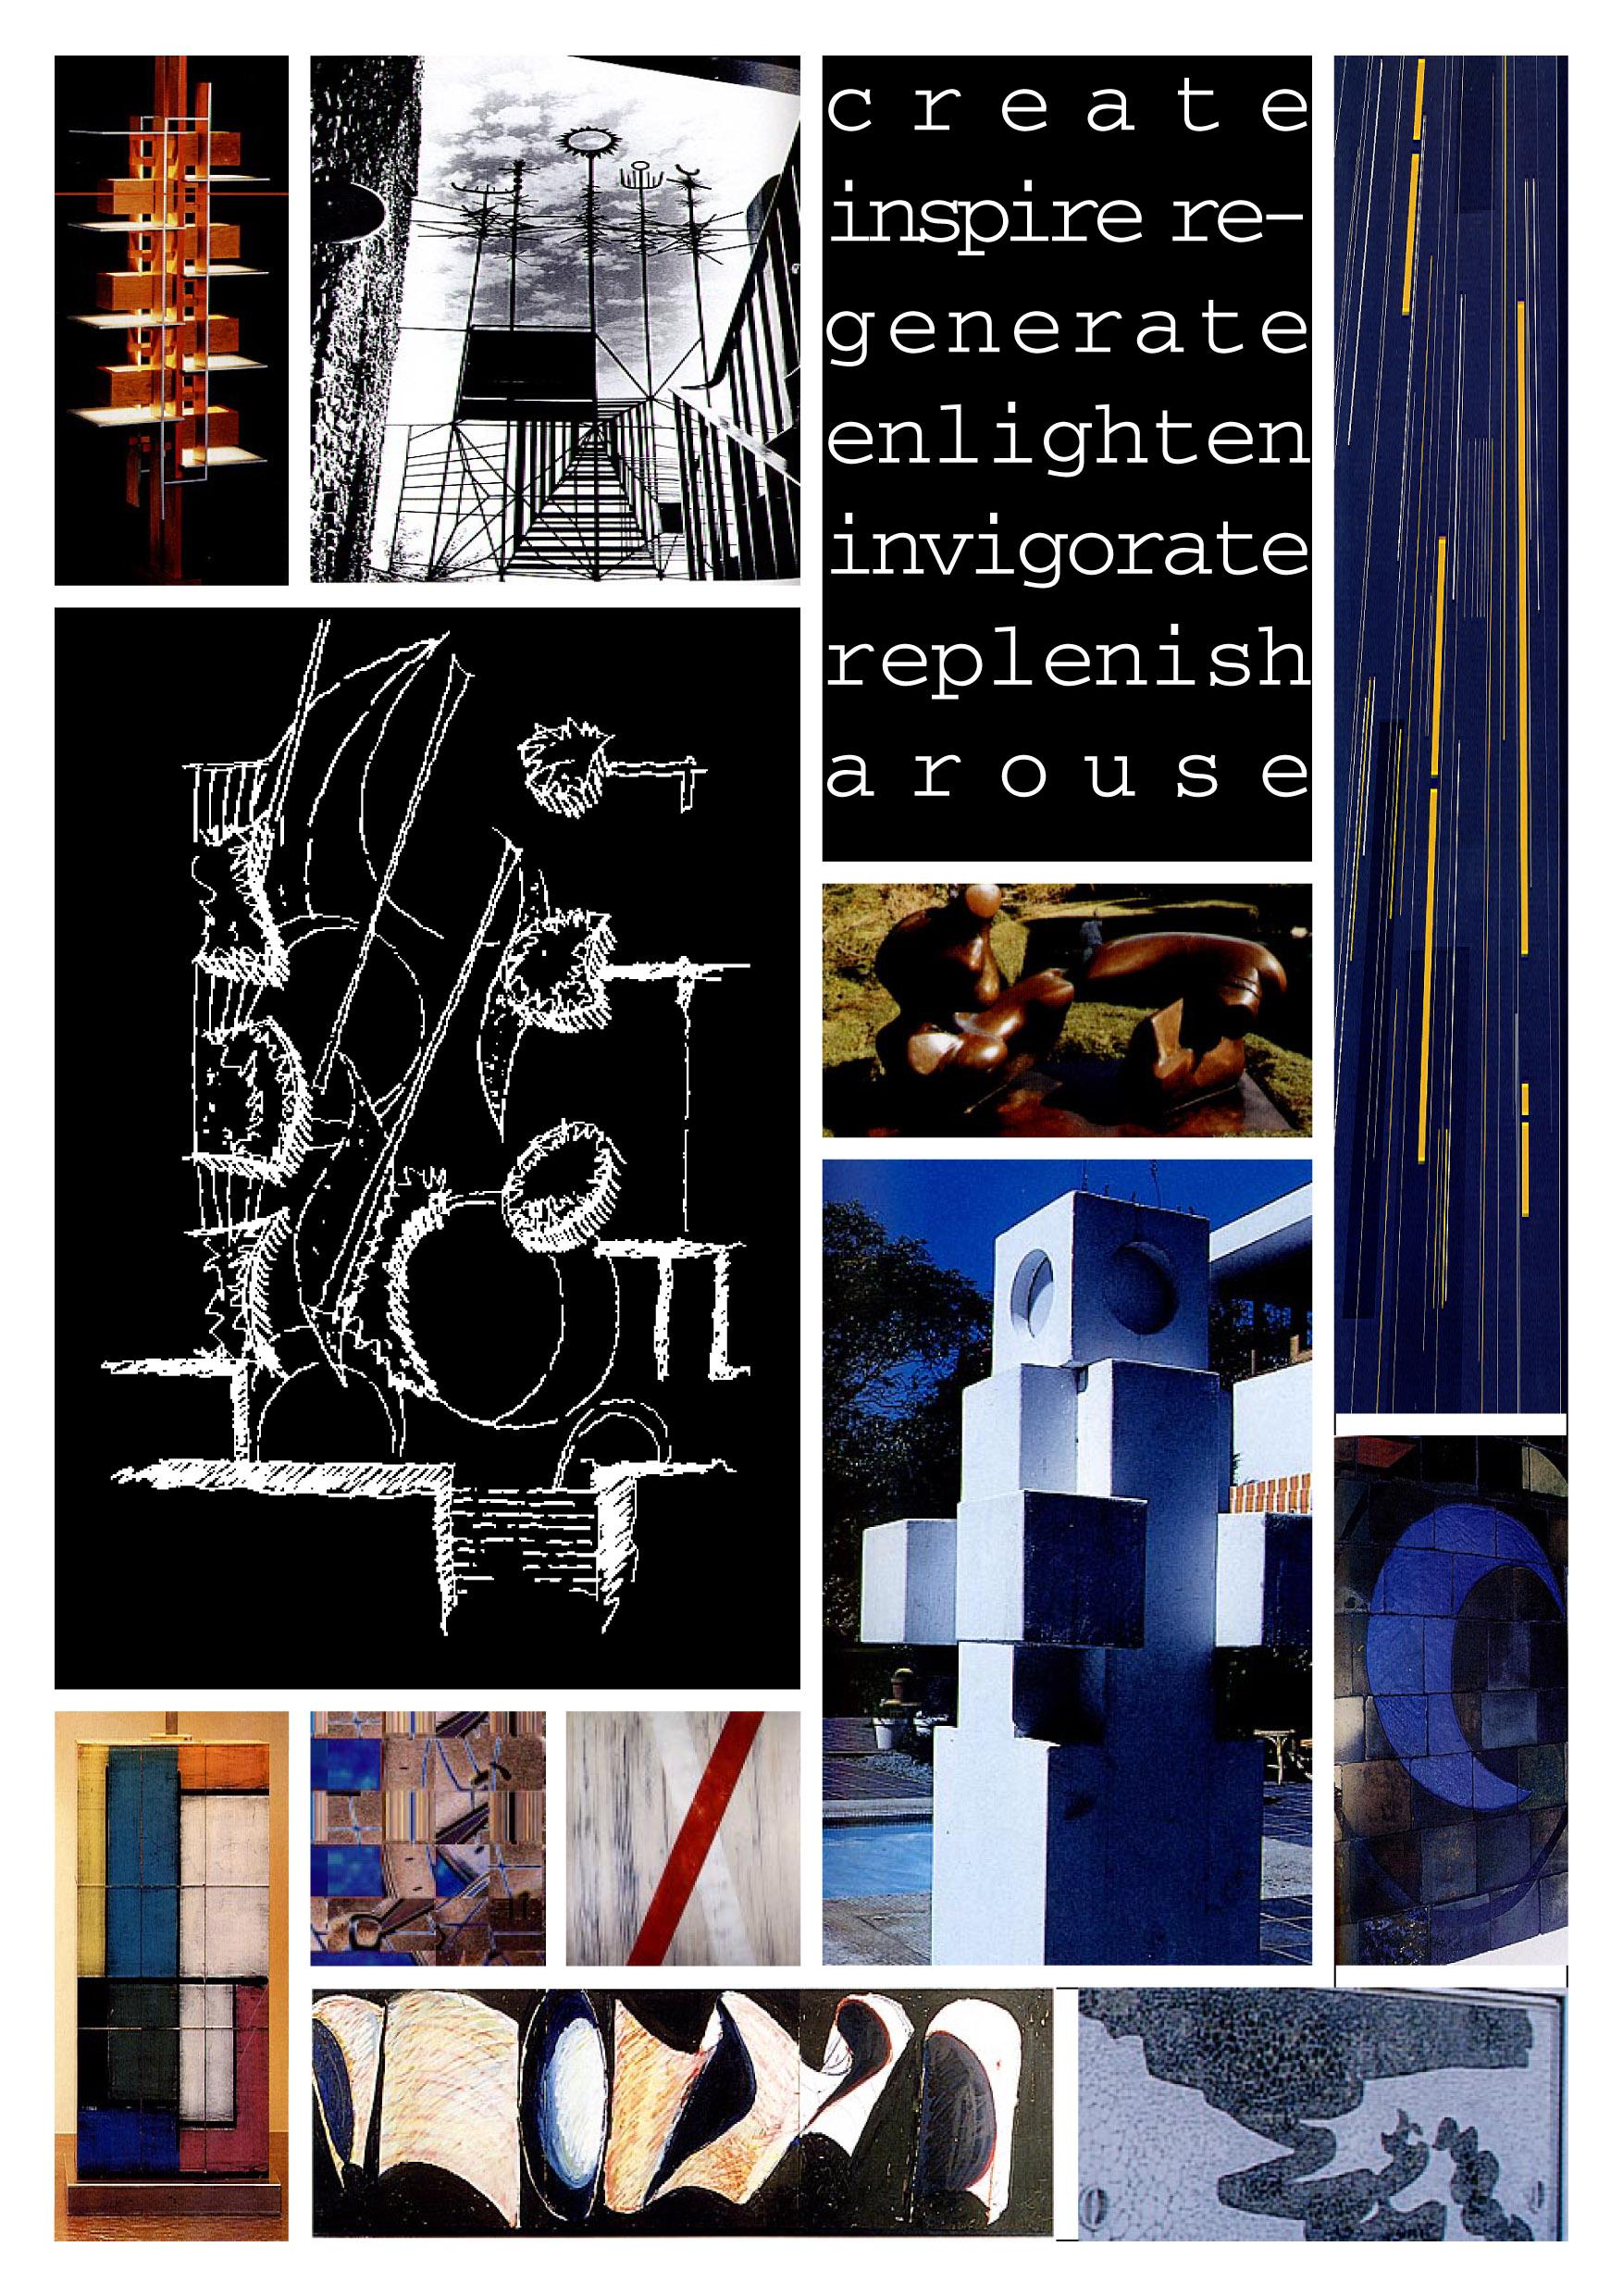 polaris-schematic2 copy.jpg